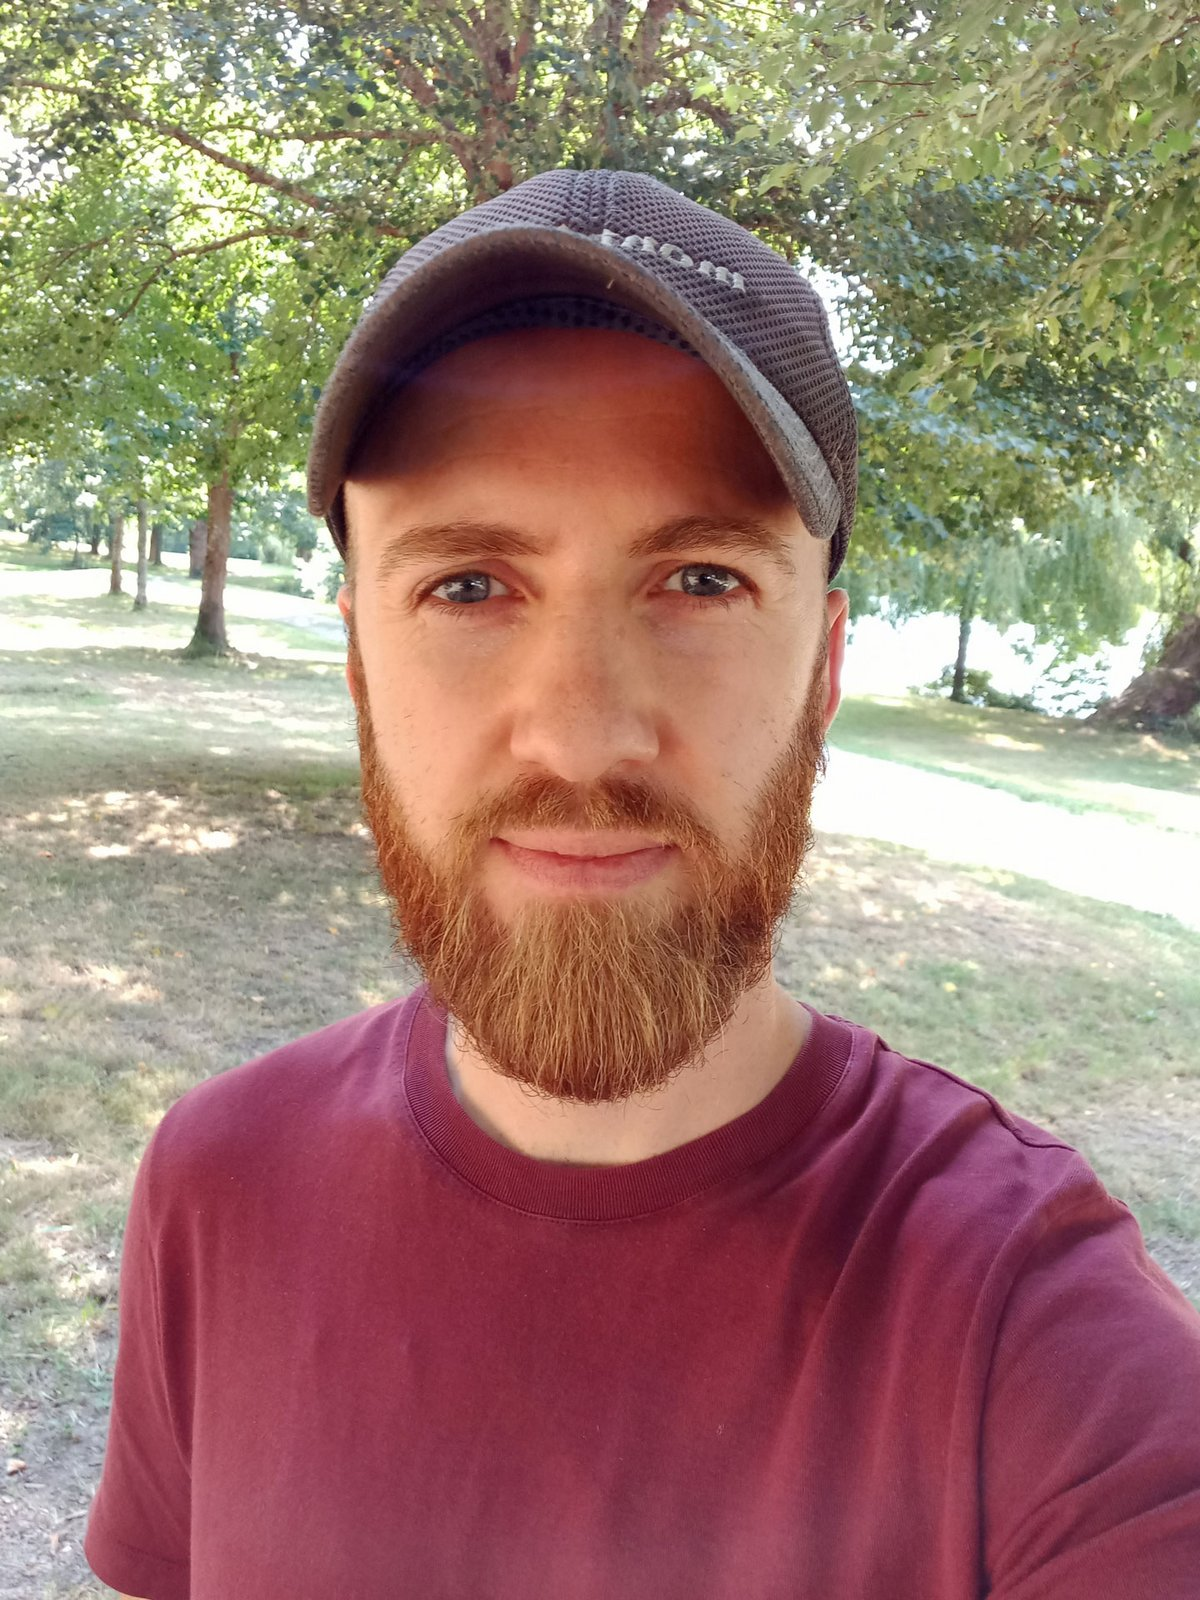 selfie sans mode portrait samsung galaxy a22 4g